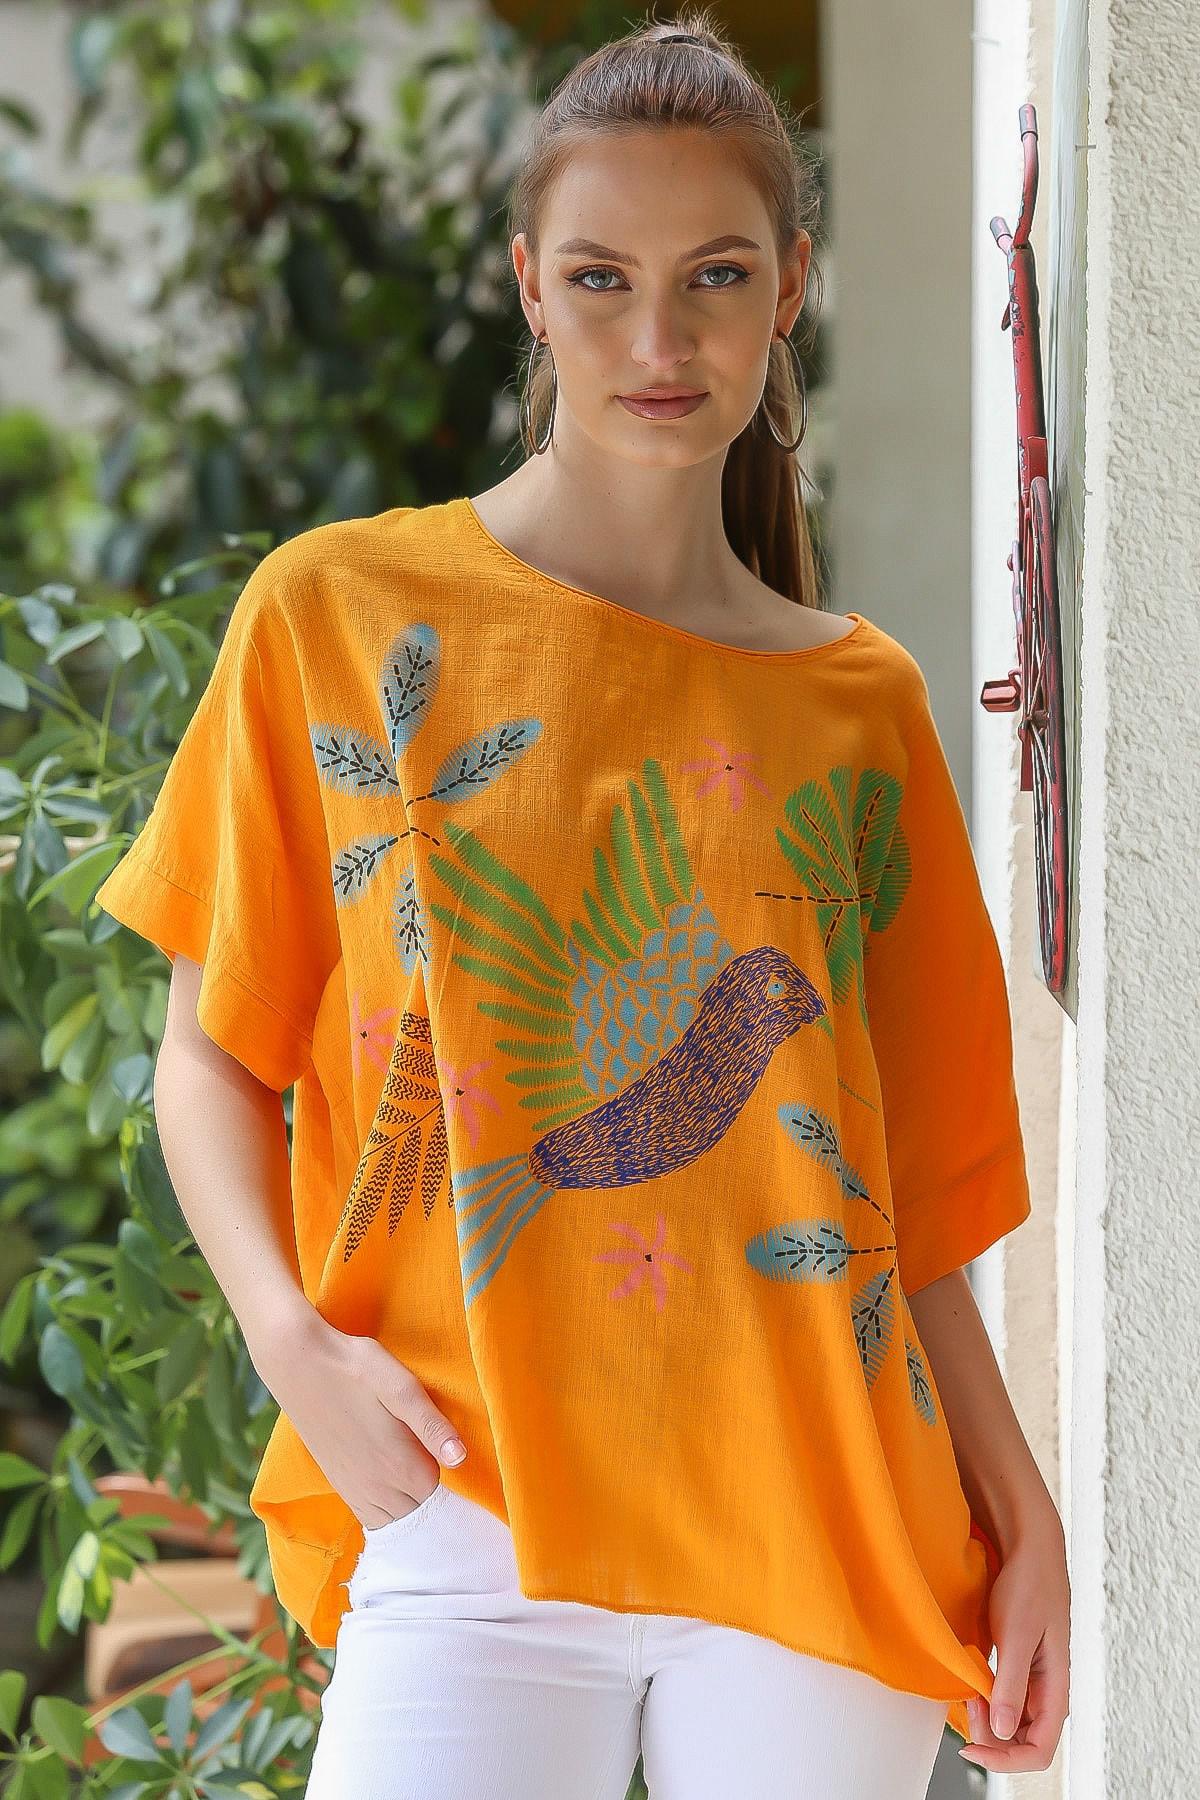 Chiccy Kadın Turuncu  Sıfır Yaka Yalı Çapkını Kuş Desenli Salaş Dokuma Bluz M10010200BL95418 2